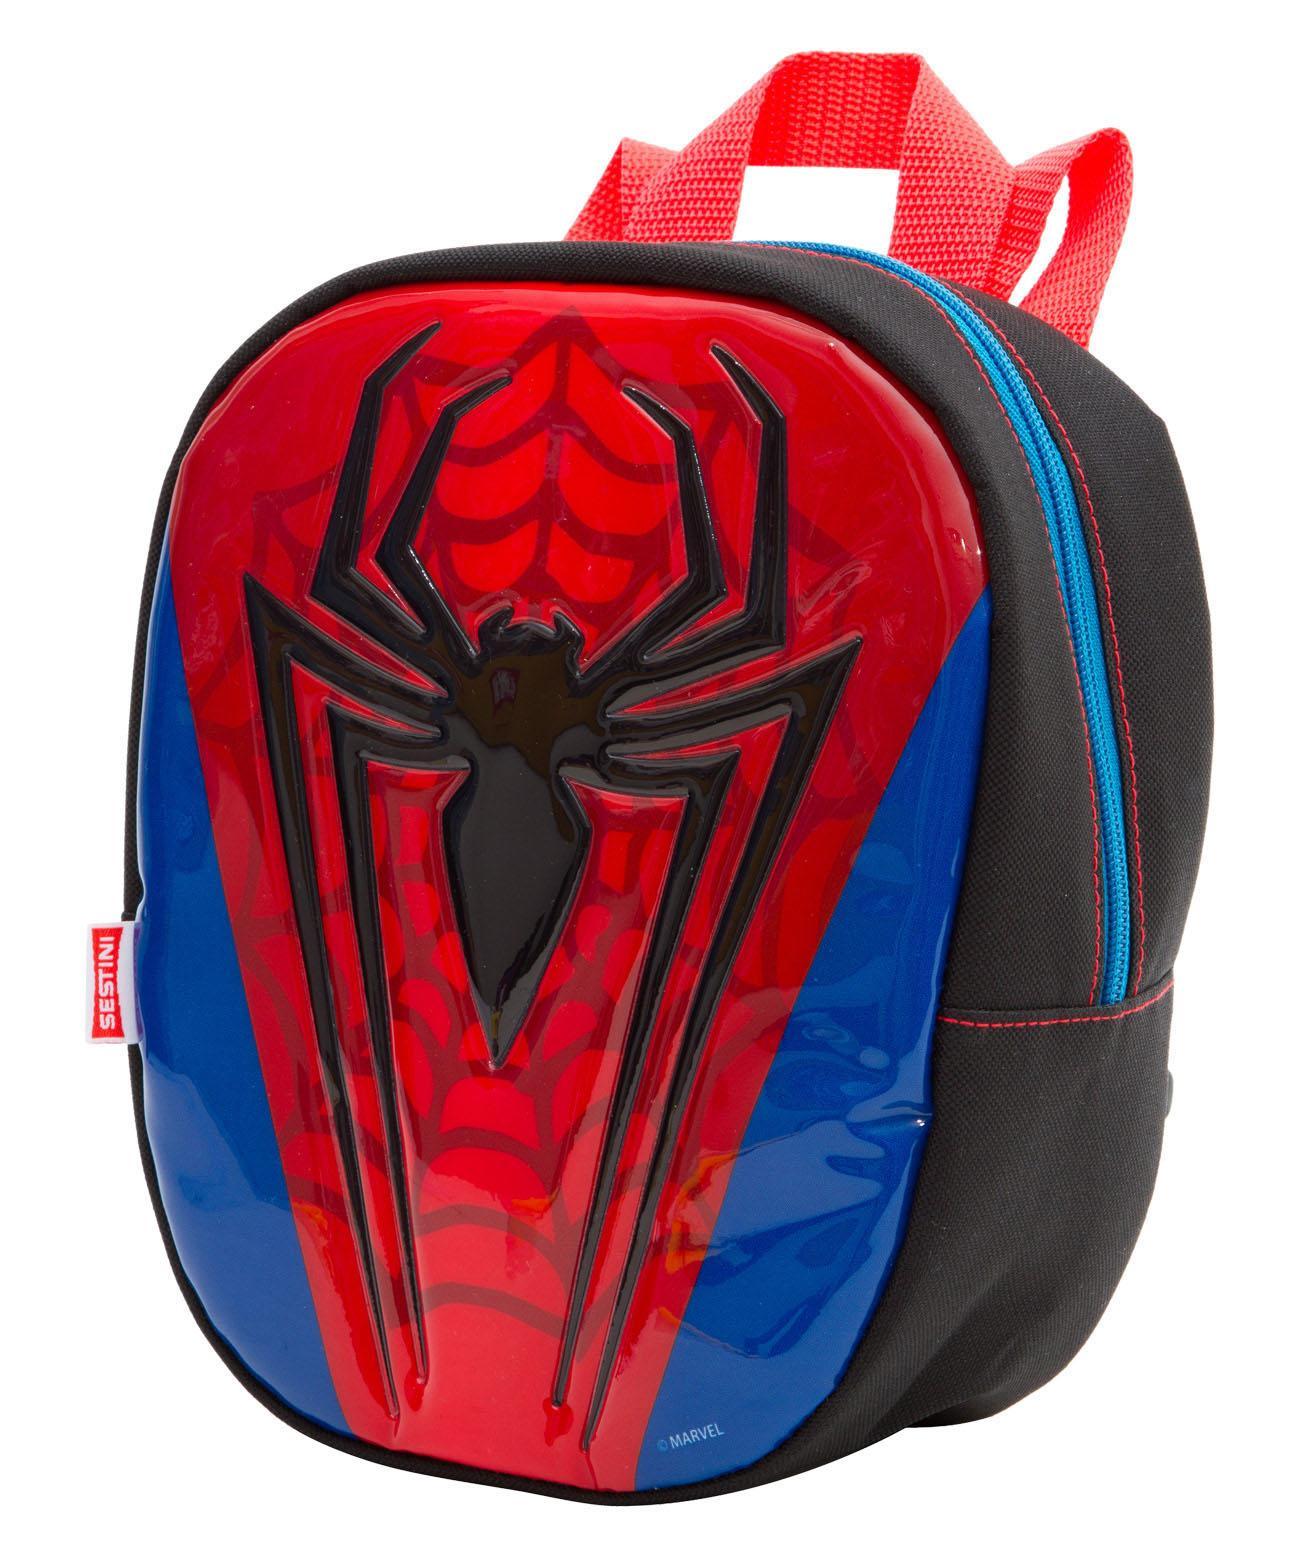 Lancheira Escolar Sestini Spiderman 64619-00